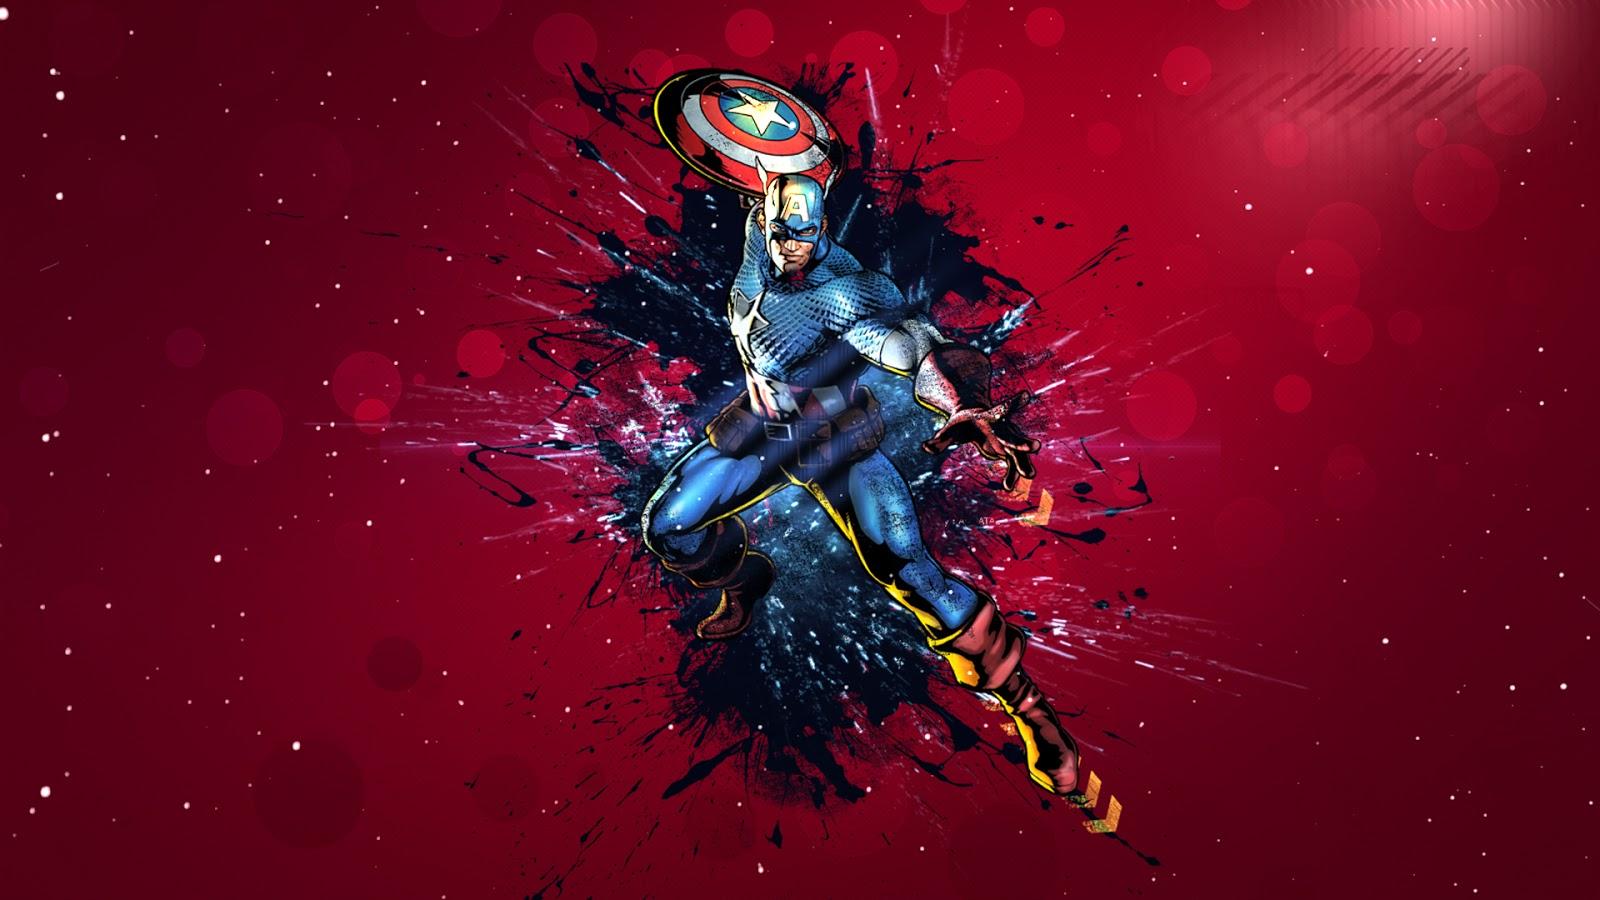 Captain America Images for Desktop